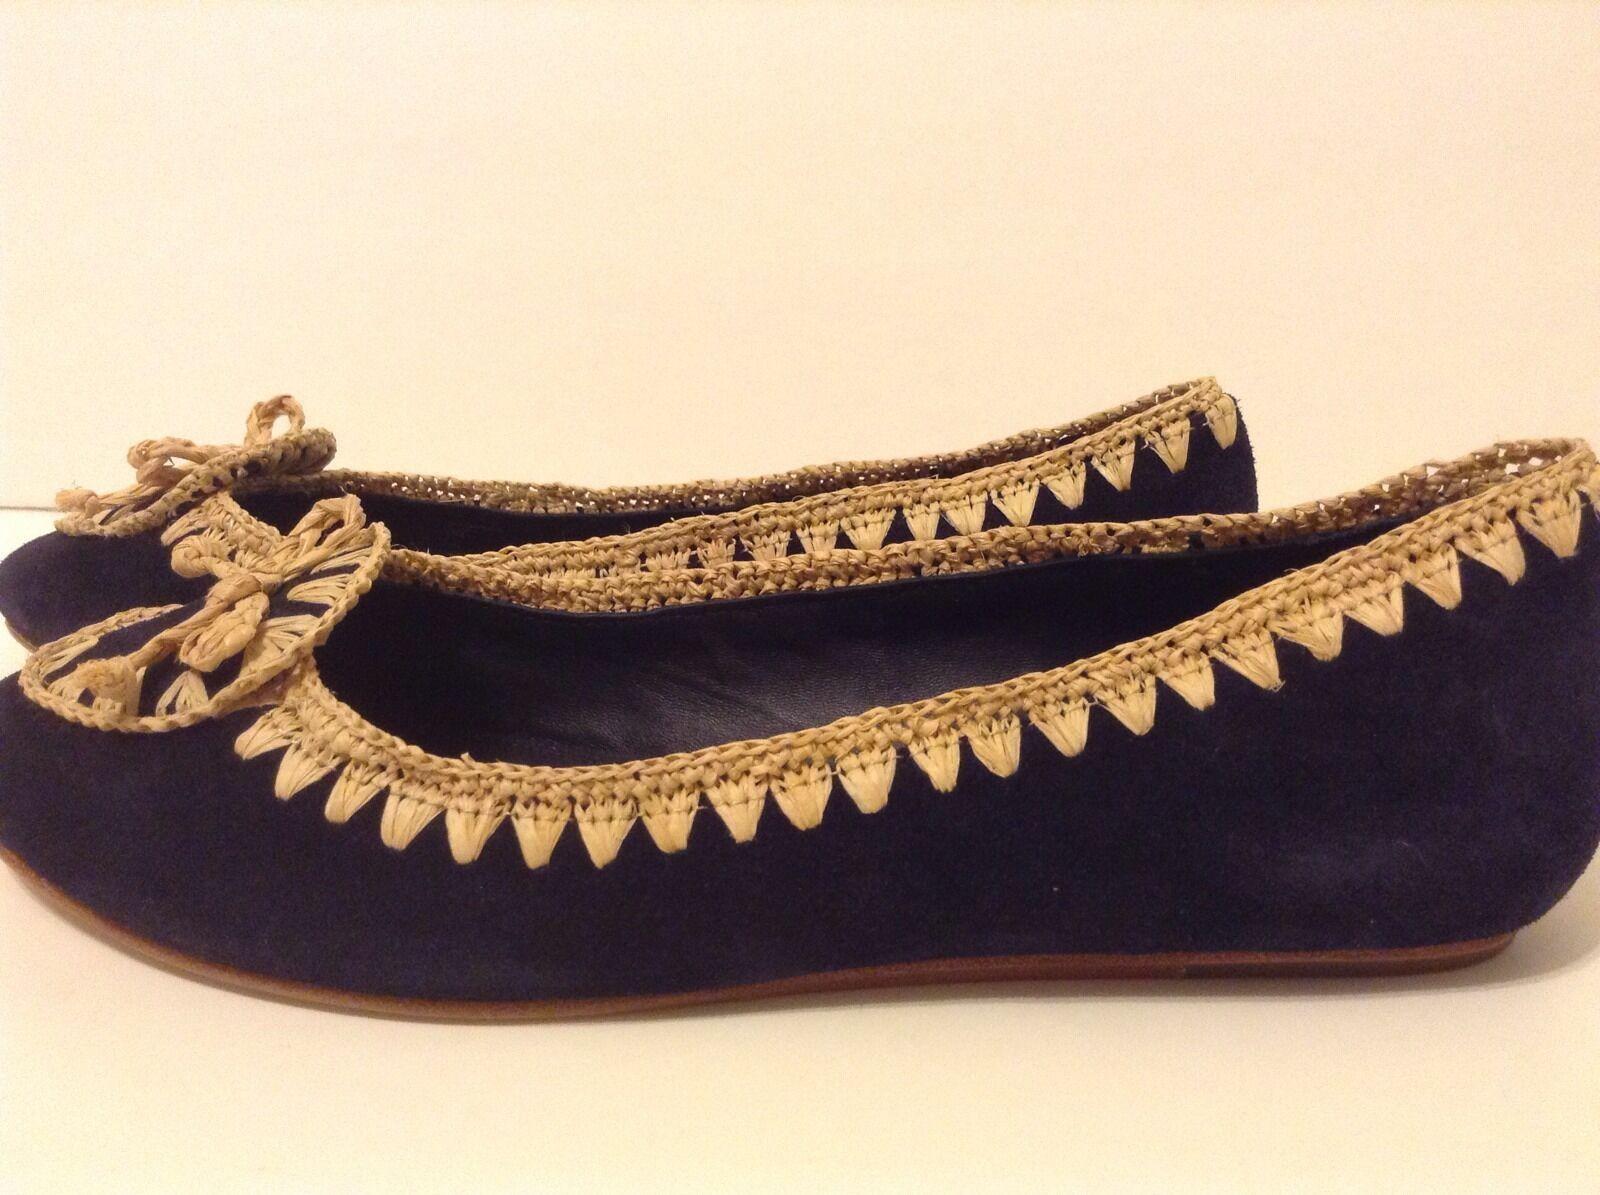 New Tory Burch sz 9,10 Natasha Ballet Flat-Split suede/Raffia Shoes